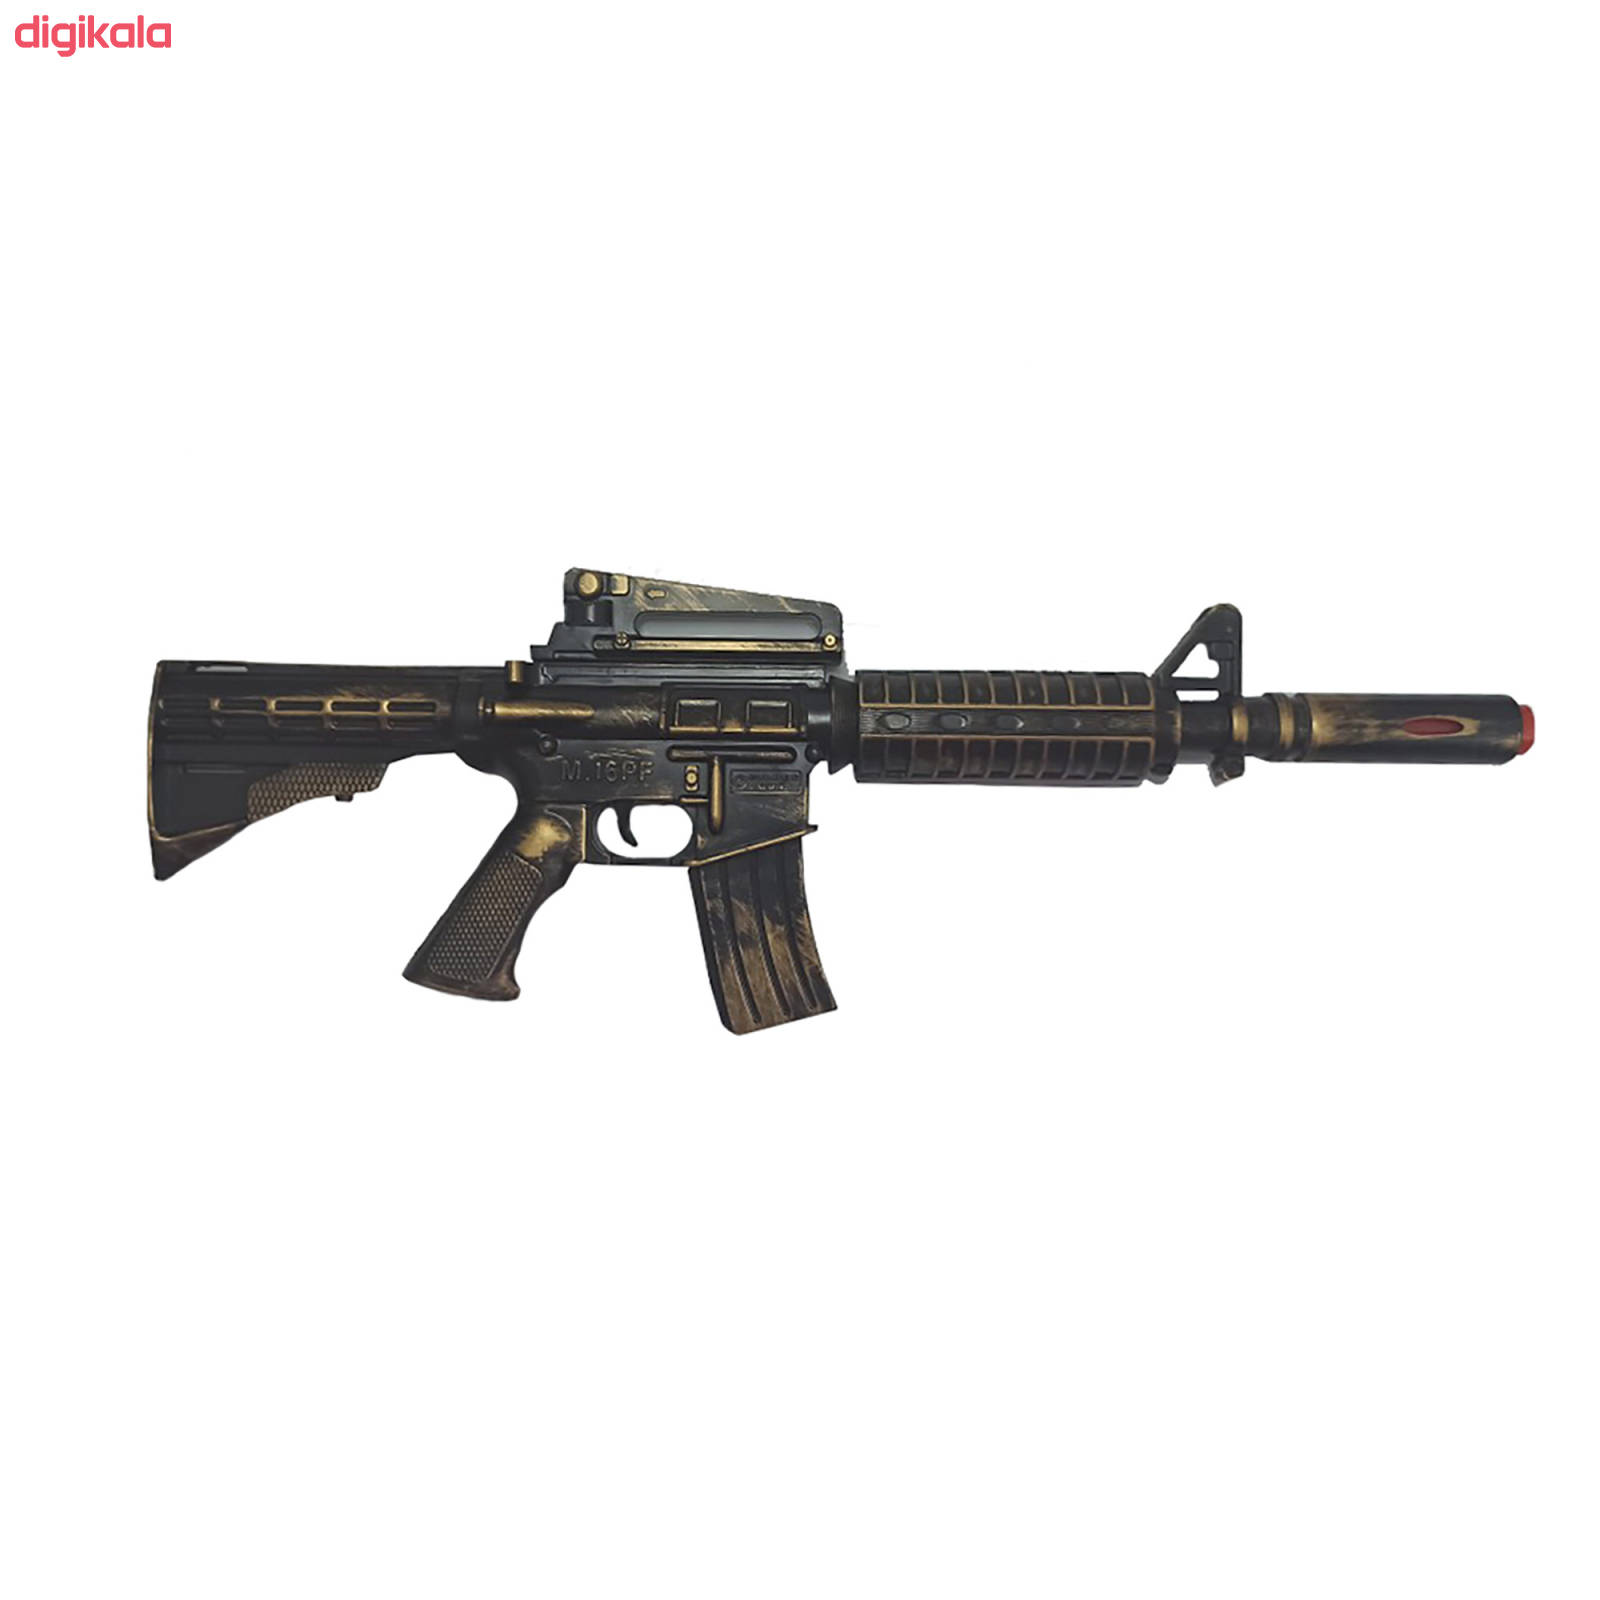 تفنگ بازی گلدن گان مدل naabsell-p10 مجموعه 3 عددی main 1 2